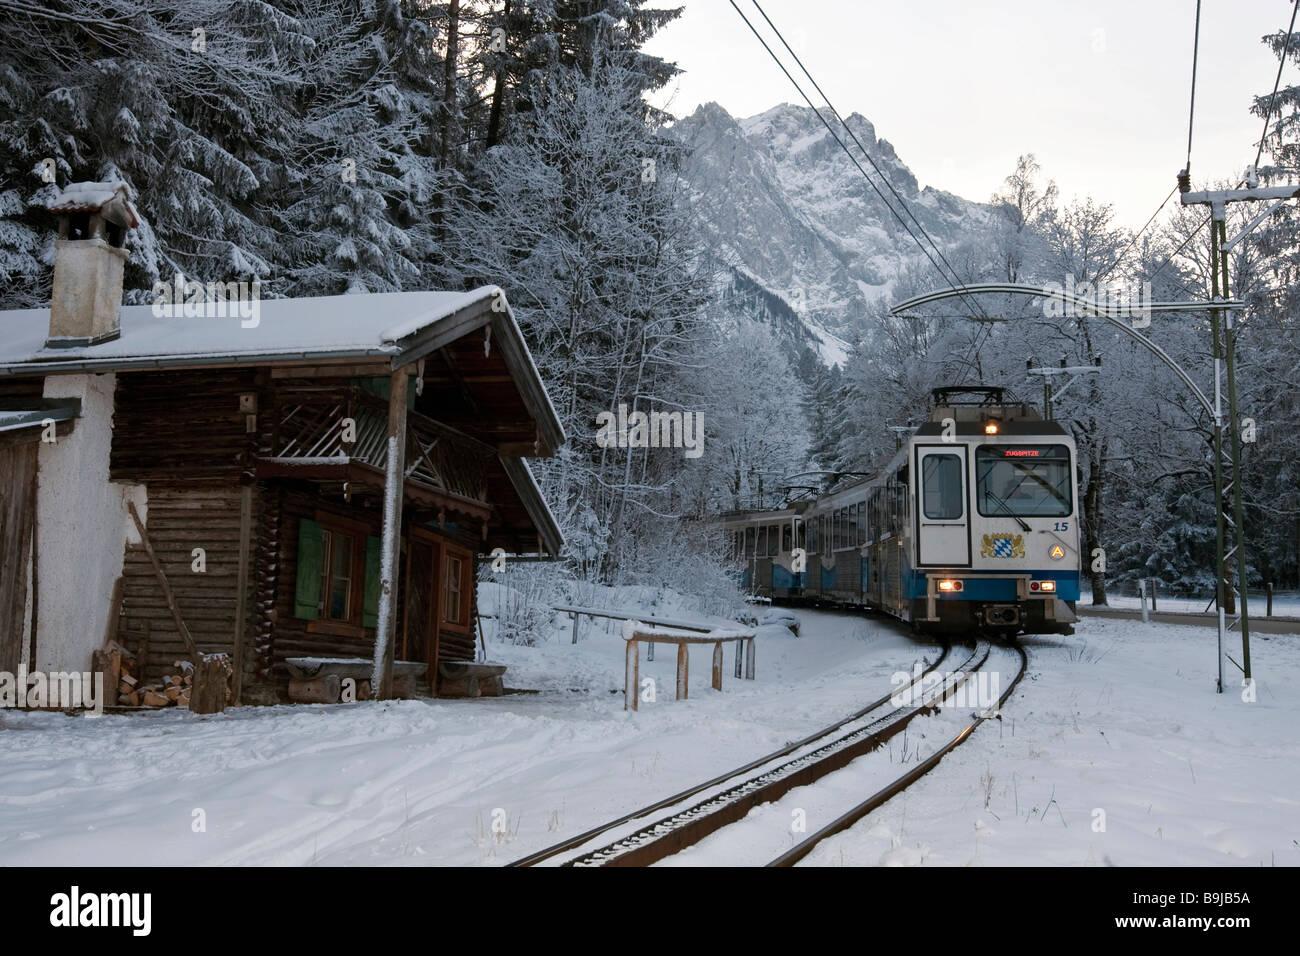 Bayerische Zugspitzbahn Railway Company train in front of Mount Zugspitze, cog railway, Grainau, Bavaria, Germany, - Stock Image